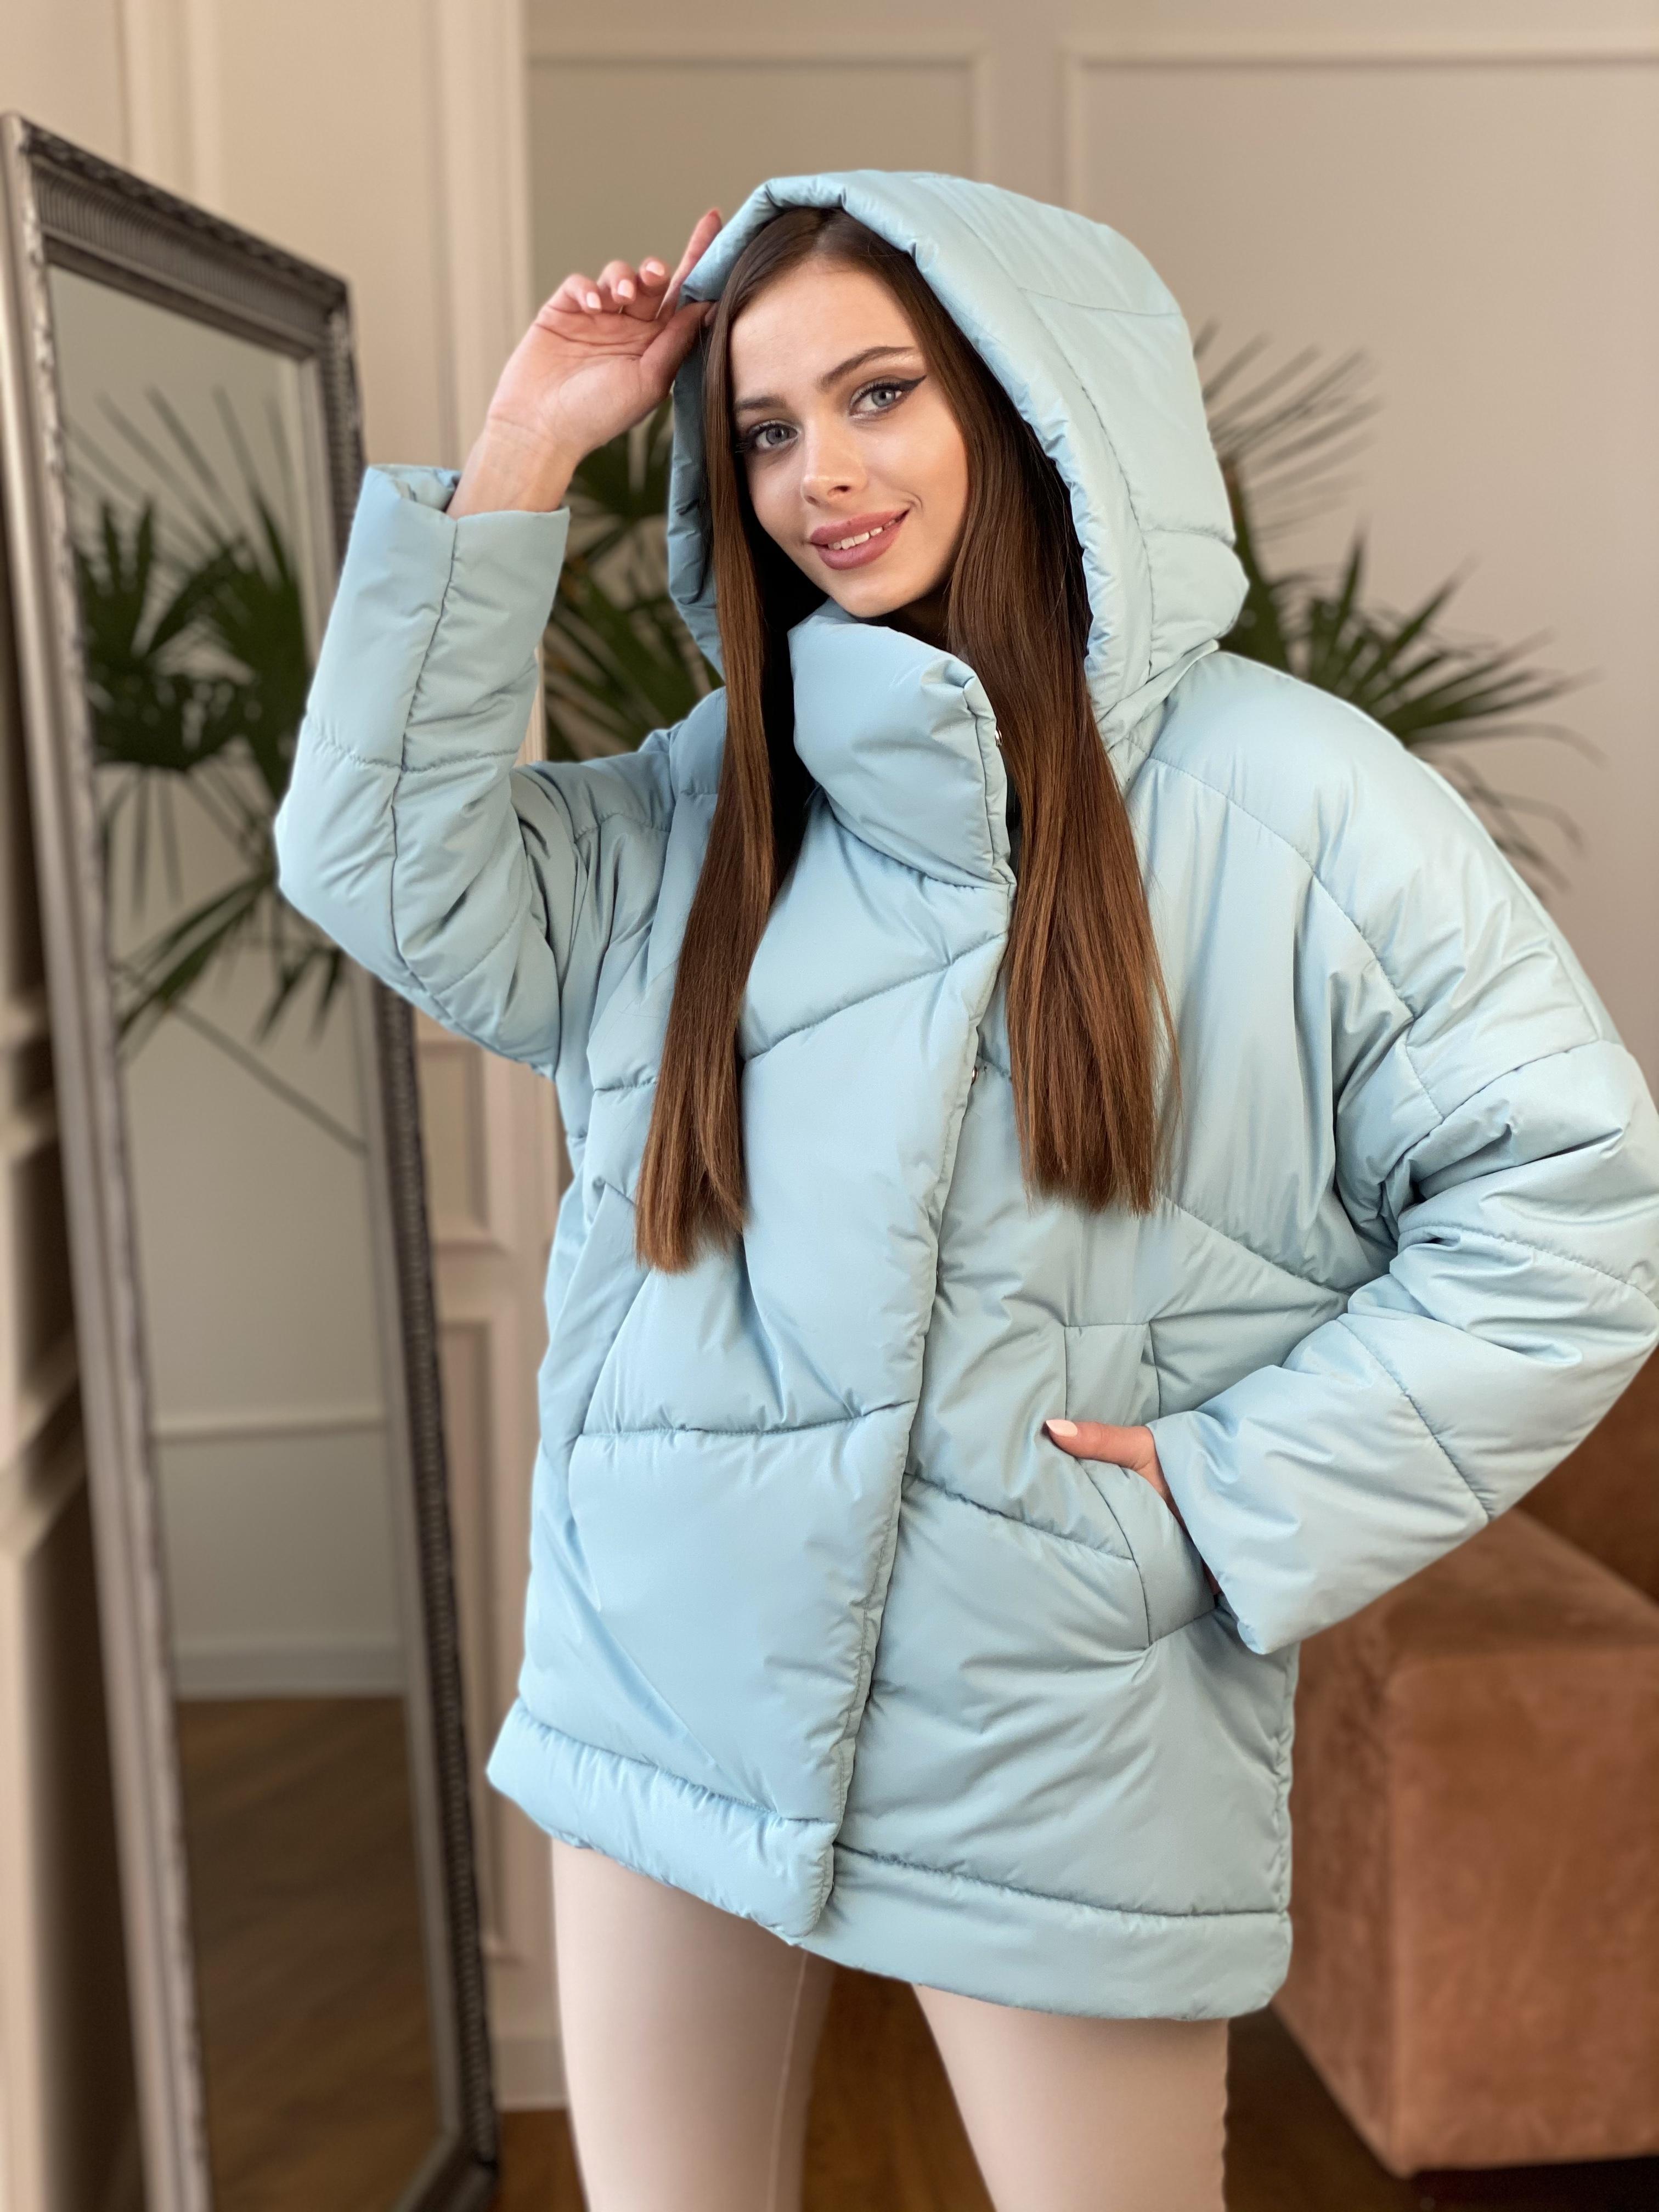 Уно куртка плащевка Ammy 10671 АРТ. 47079 Цвет: Олива - фото 5, интернет магазин tm-modus.ru